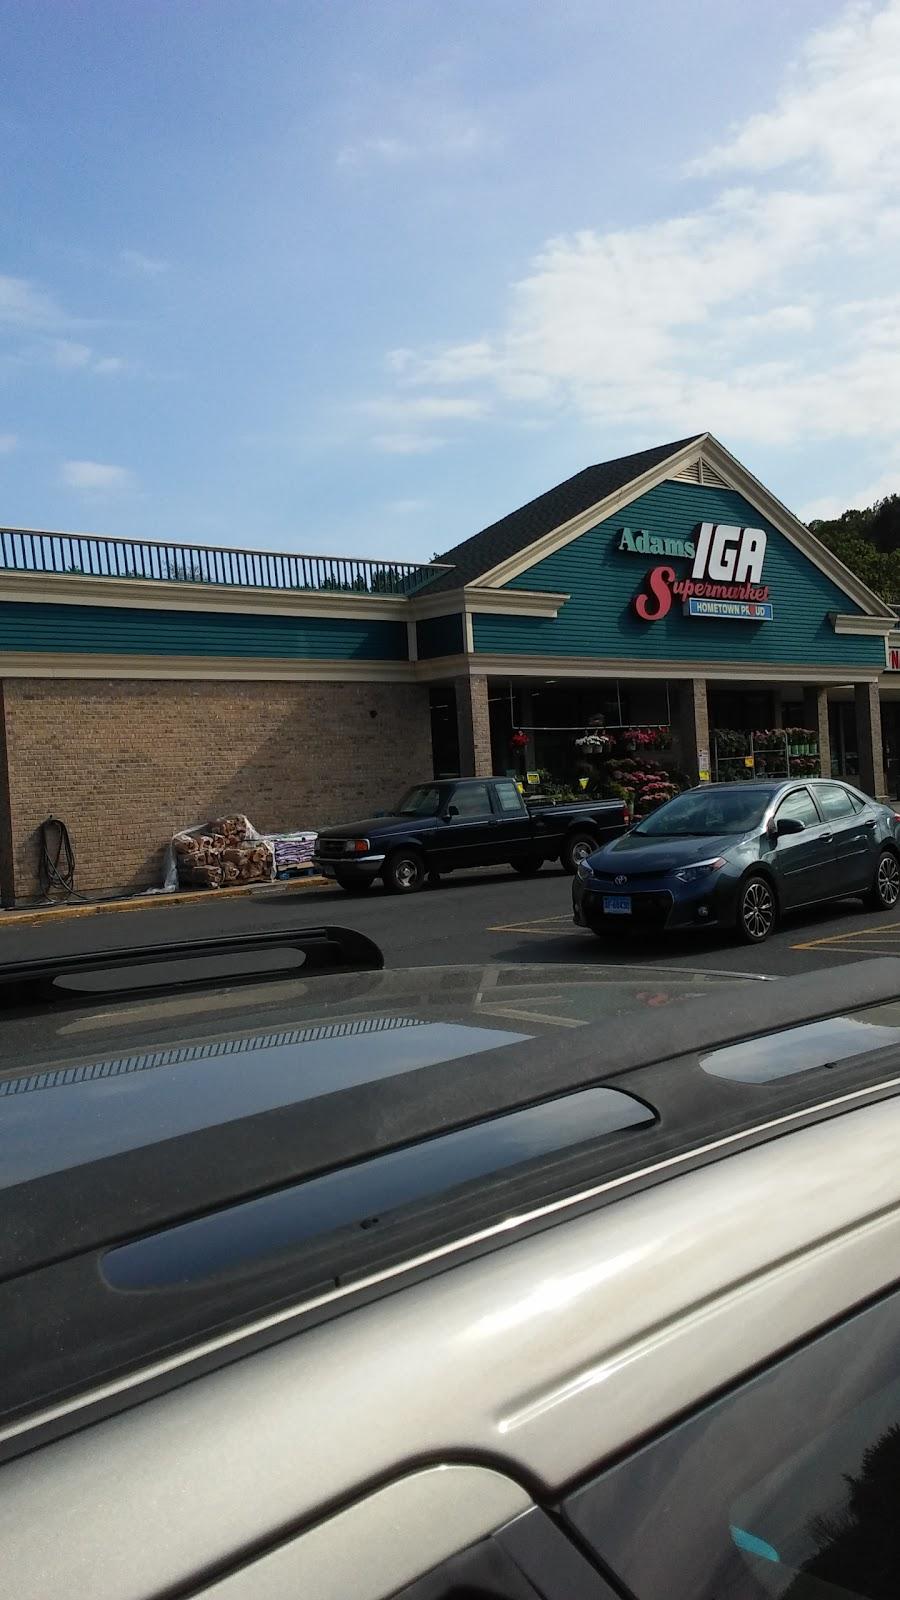 Adams Hometown Market - store  | Photo 4 of 7 | Address: 311 Main St, Terryville, CT 06786, USA | Phone: (860) 583-9177